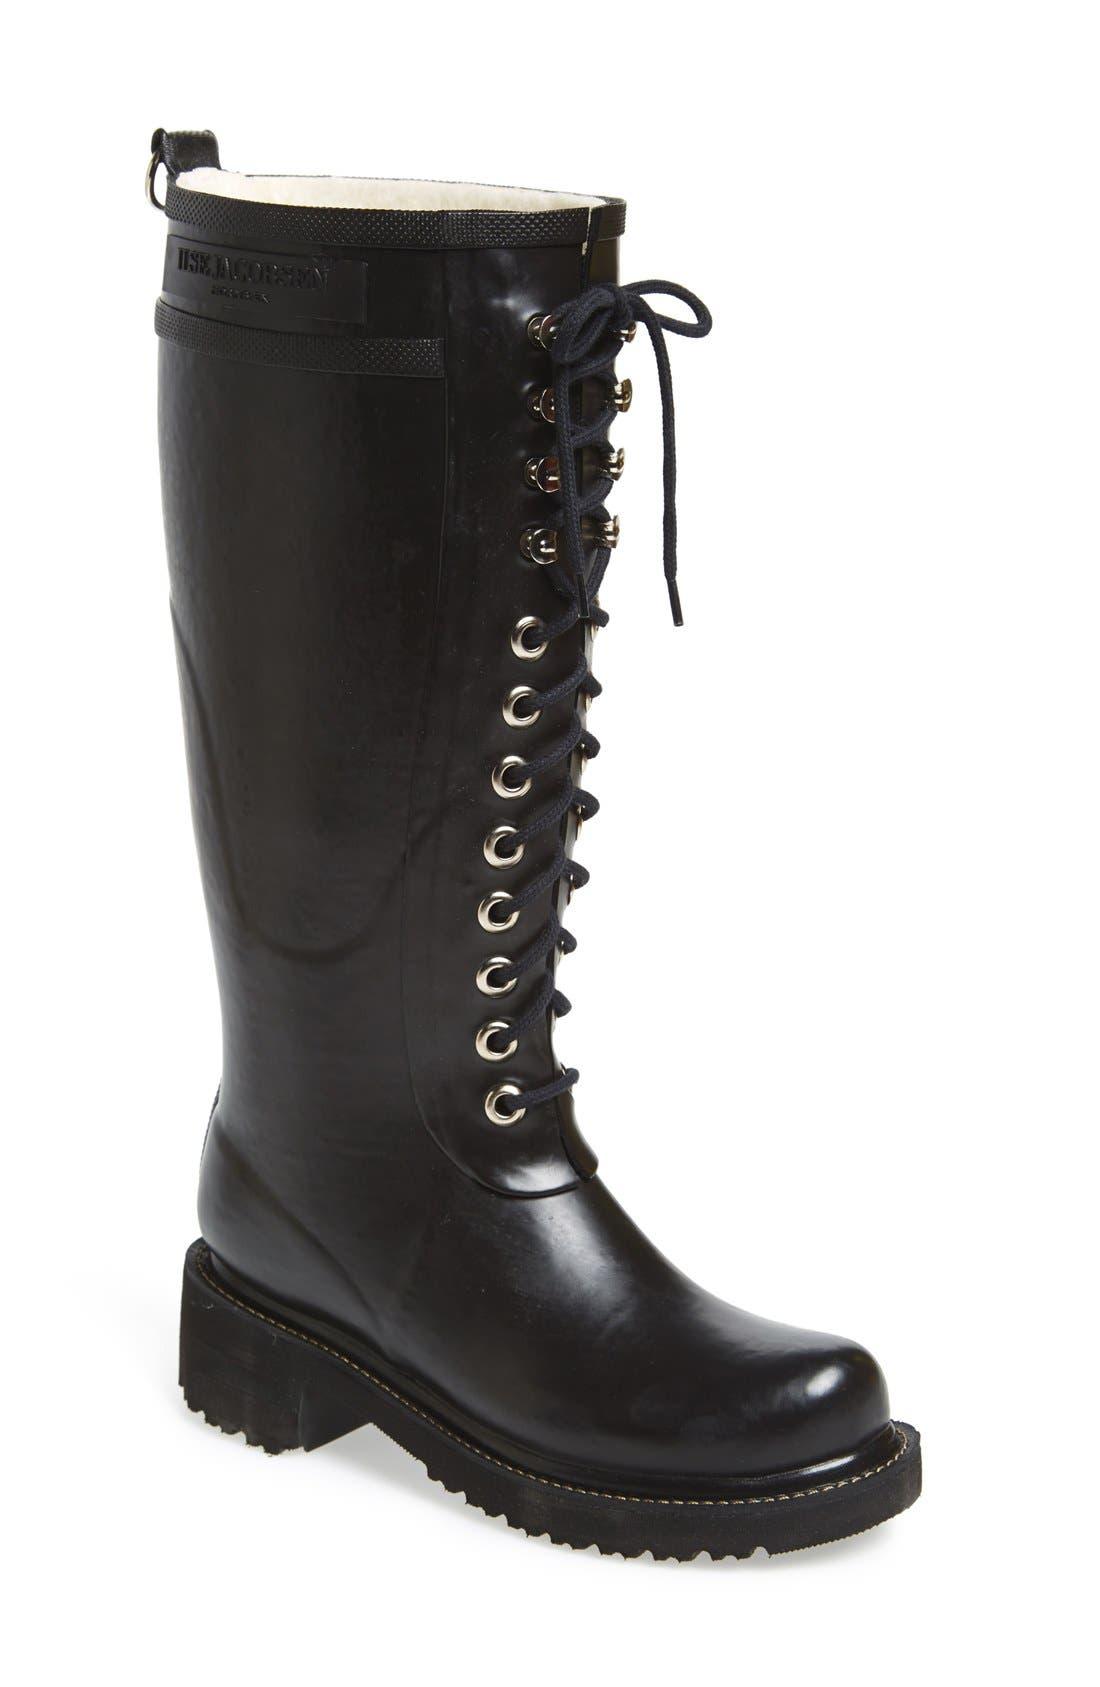 Ilse Jacobsen Waterproof Lace-Up Snow/Rain Boot (Women)